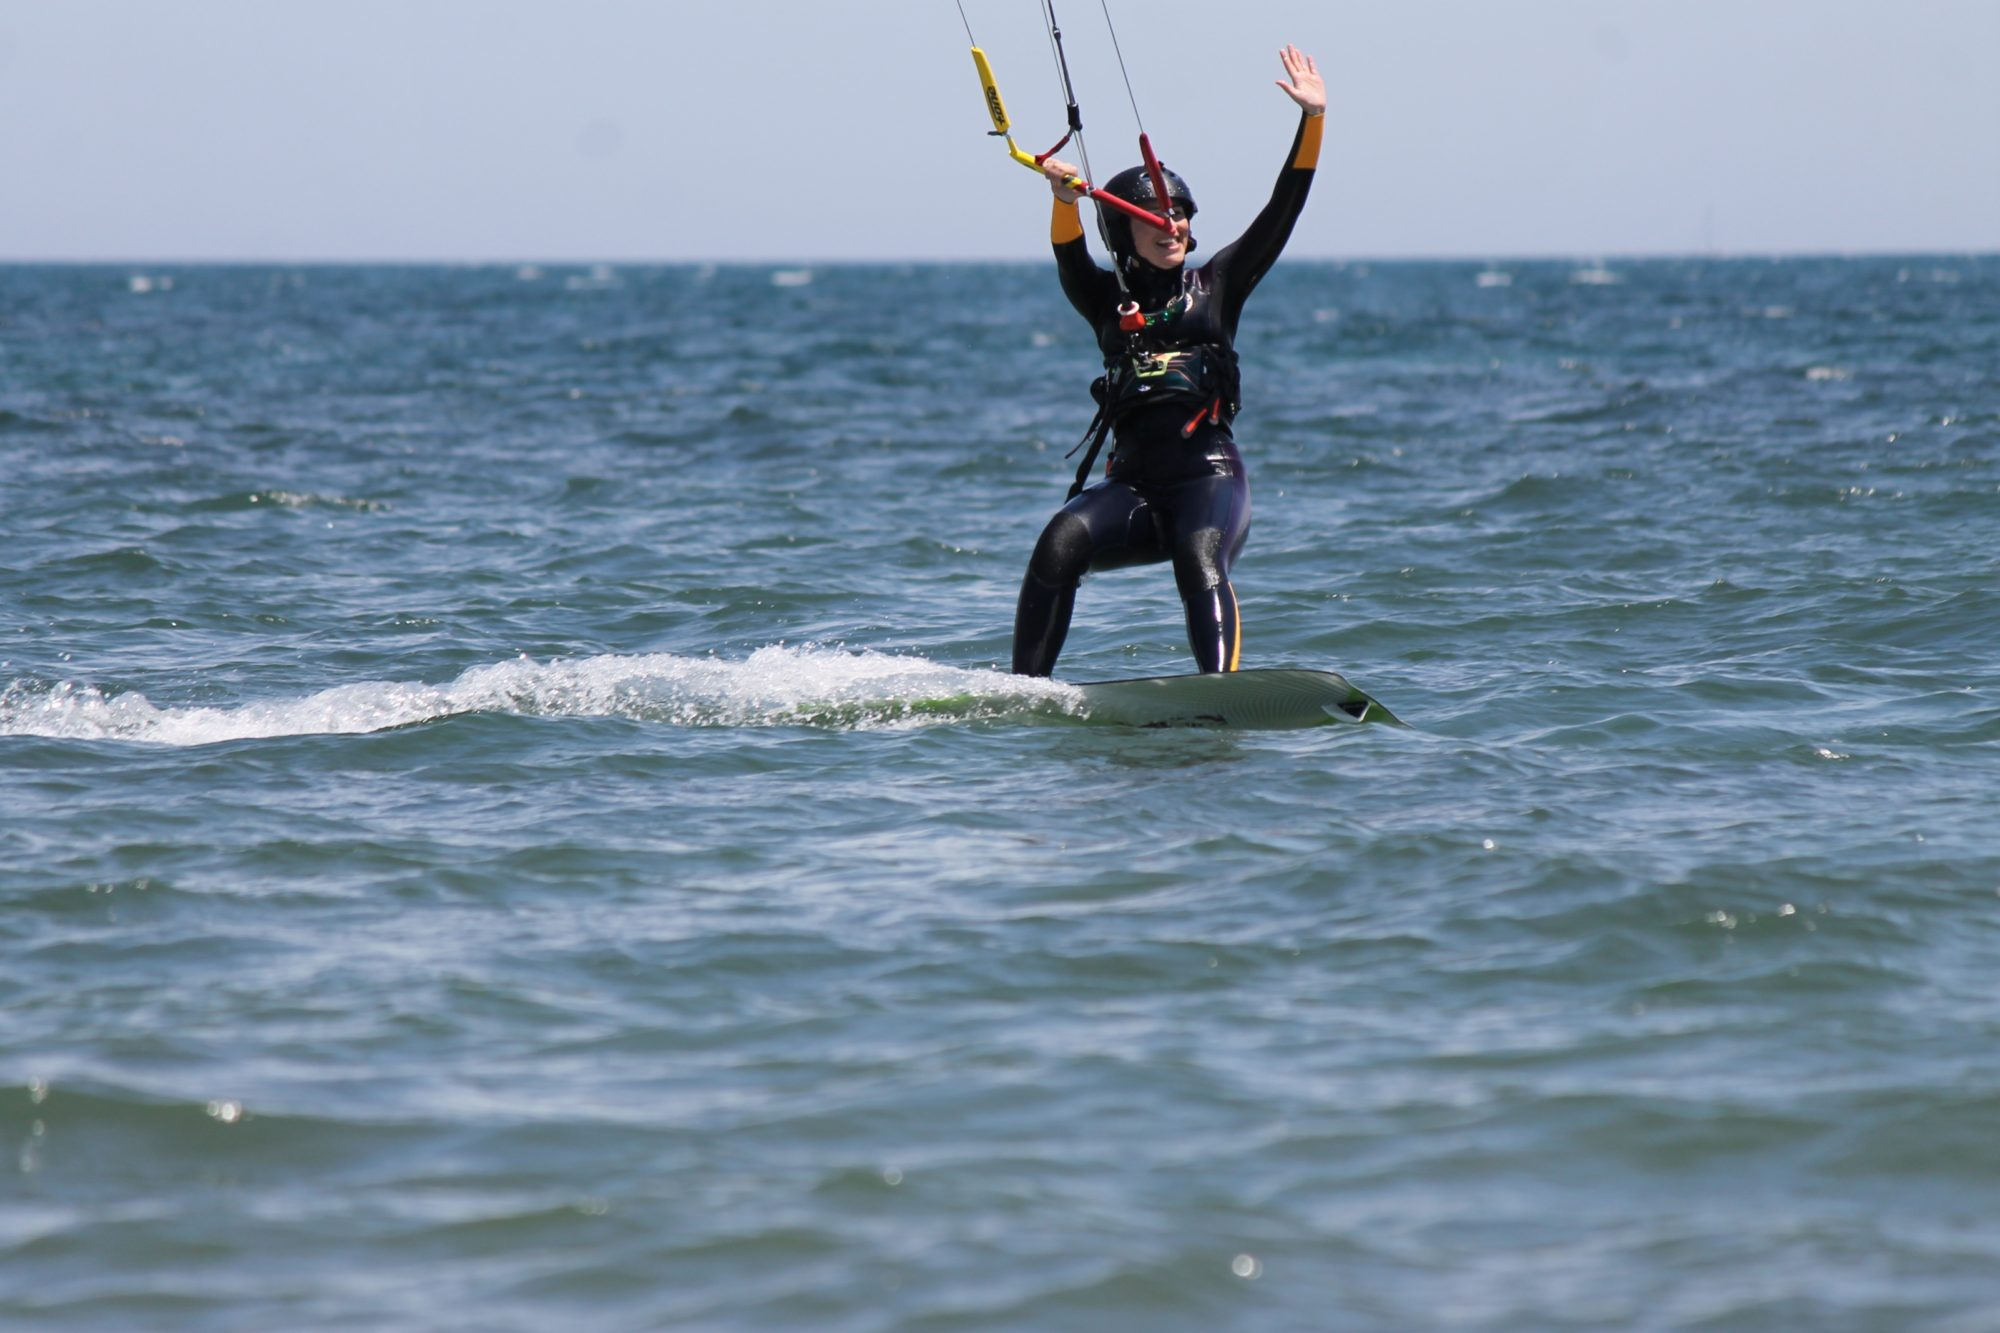 Imparare il kitesurf in Sardegna